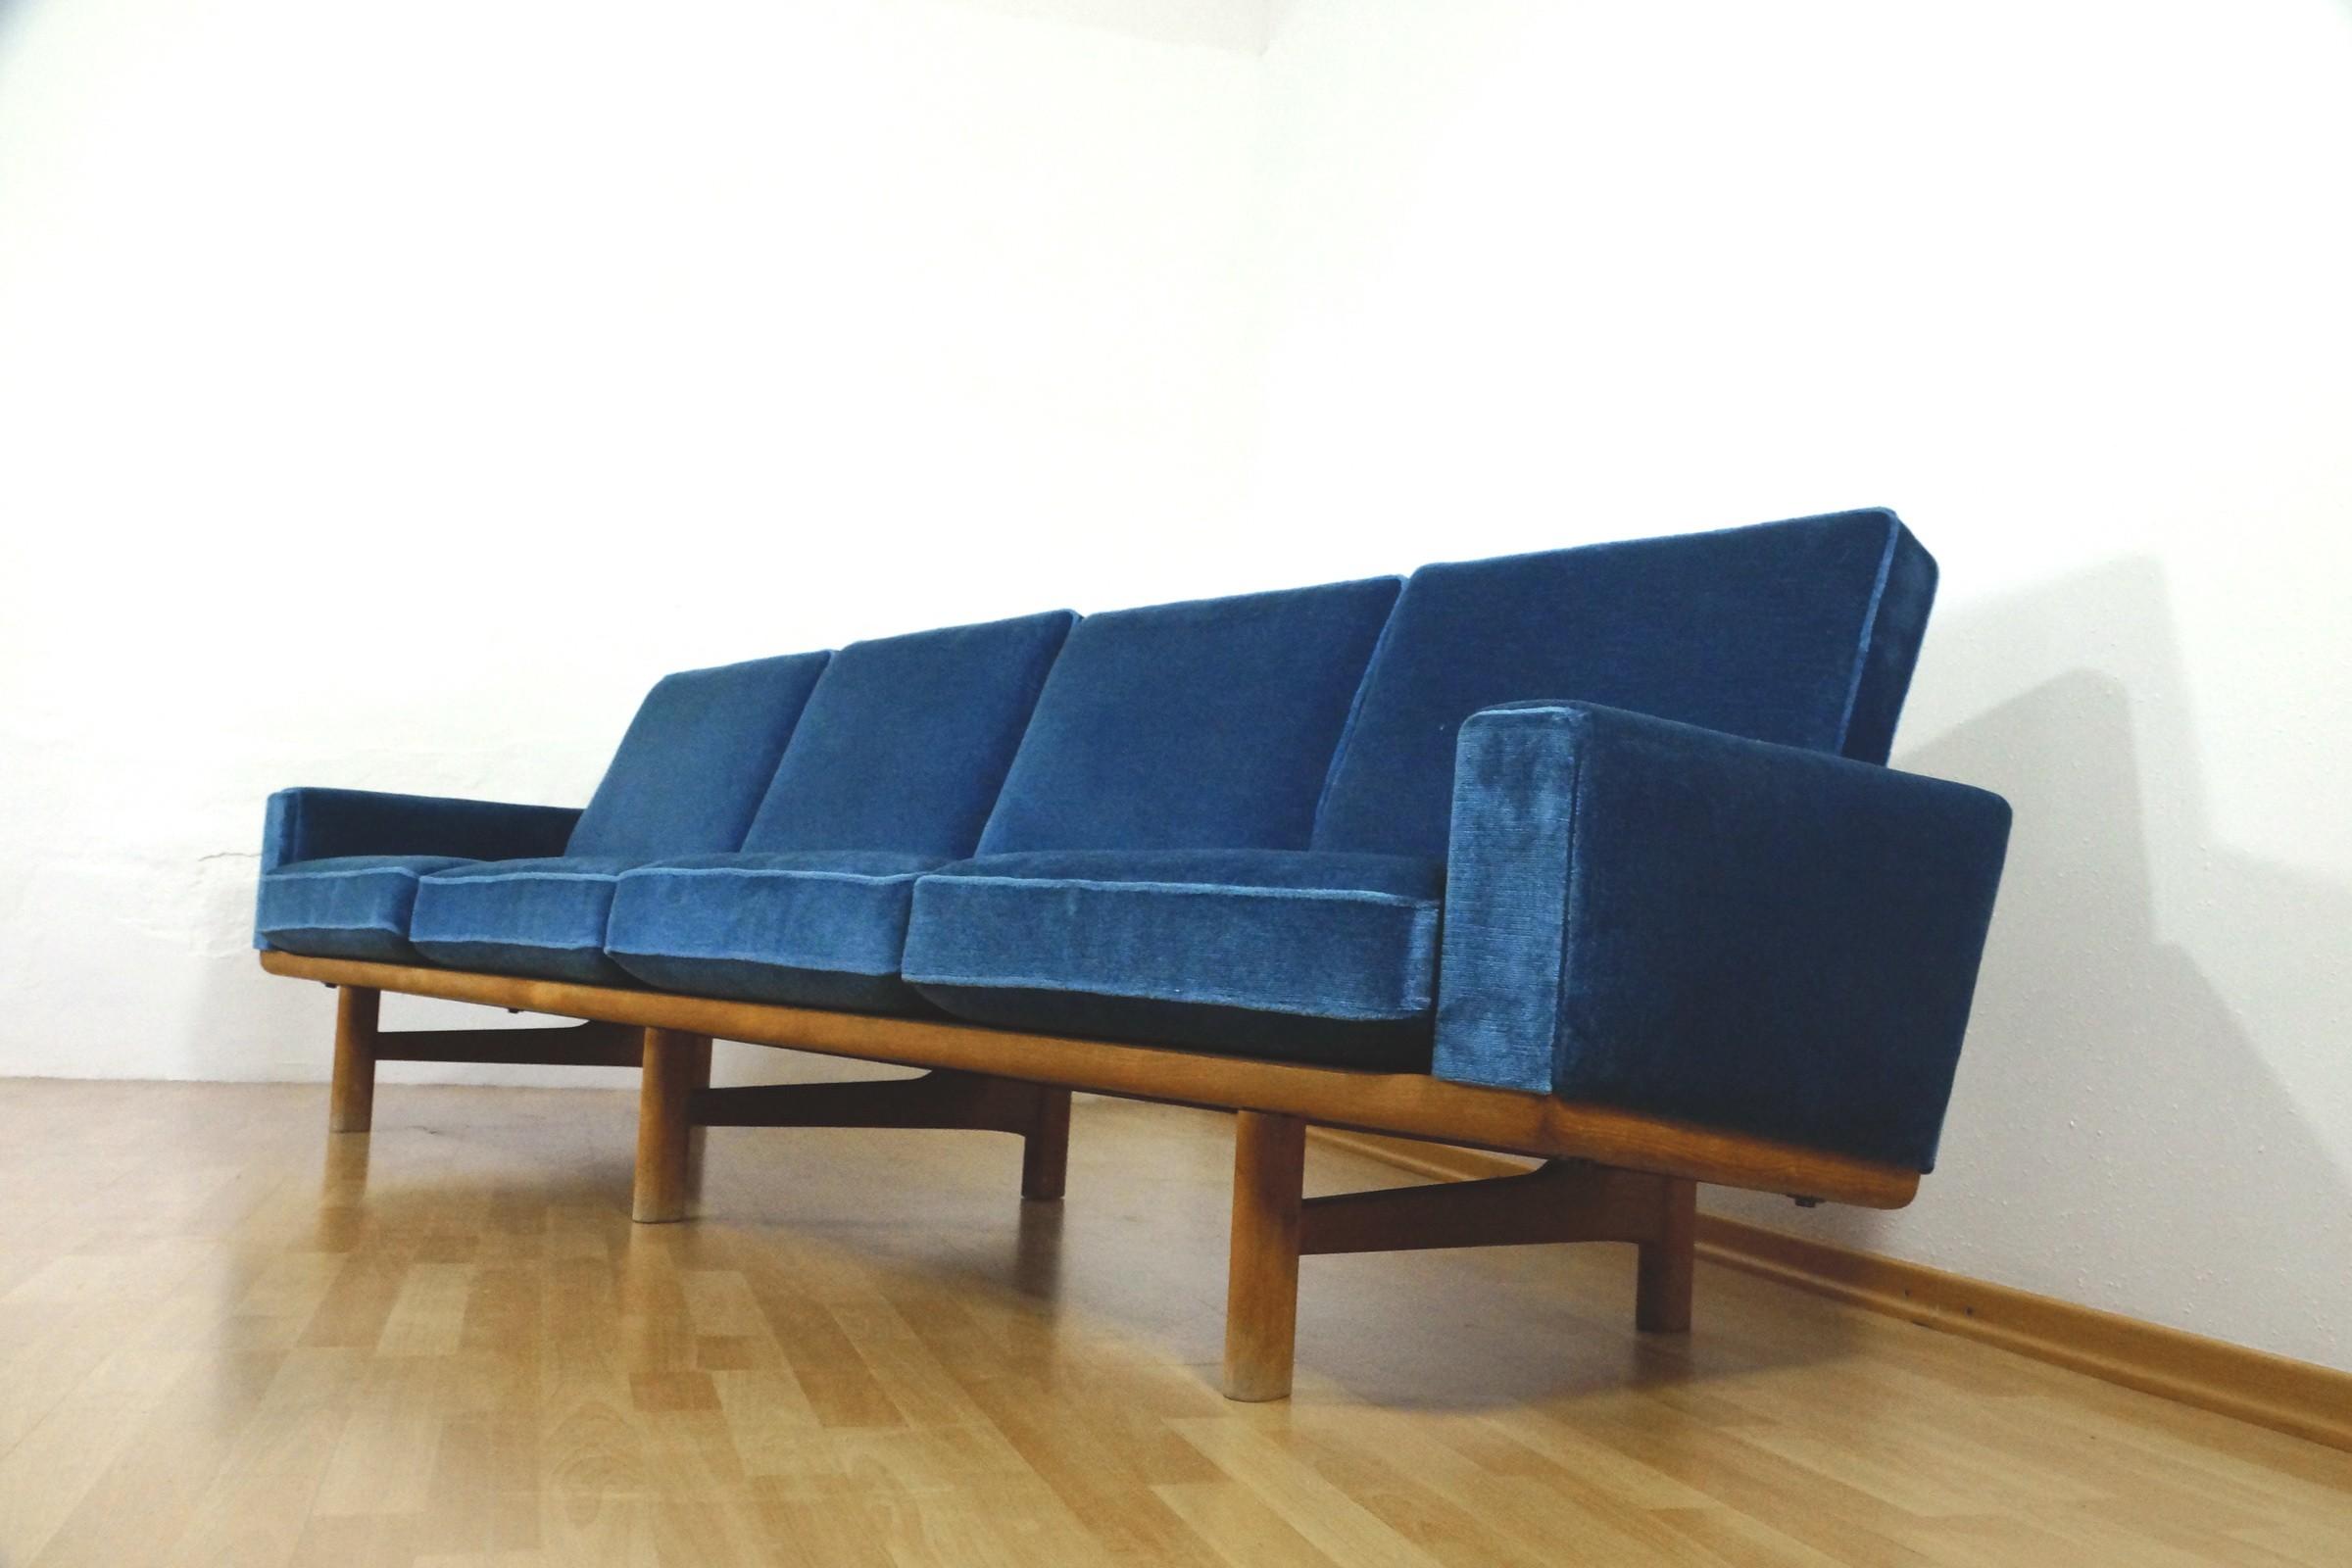 GETAMA 4 seater Blue Sofa Hans J Wegner GE 236 4 1950s